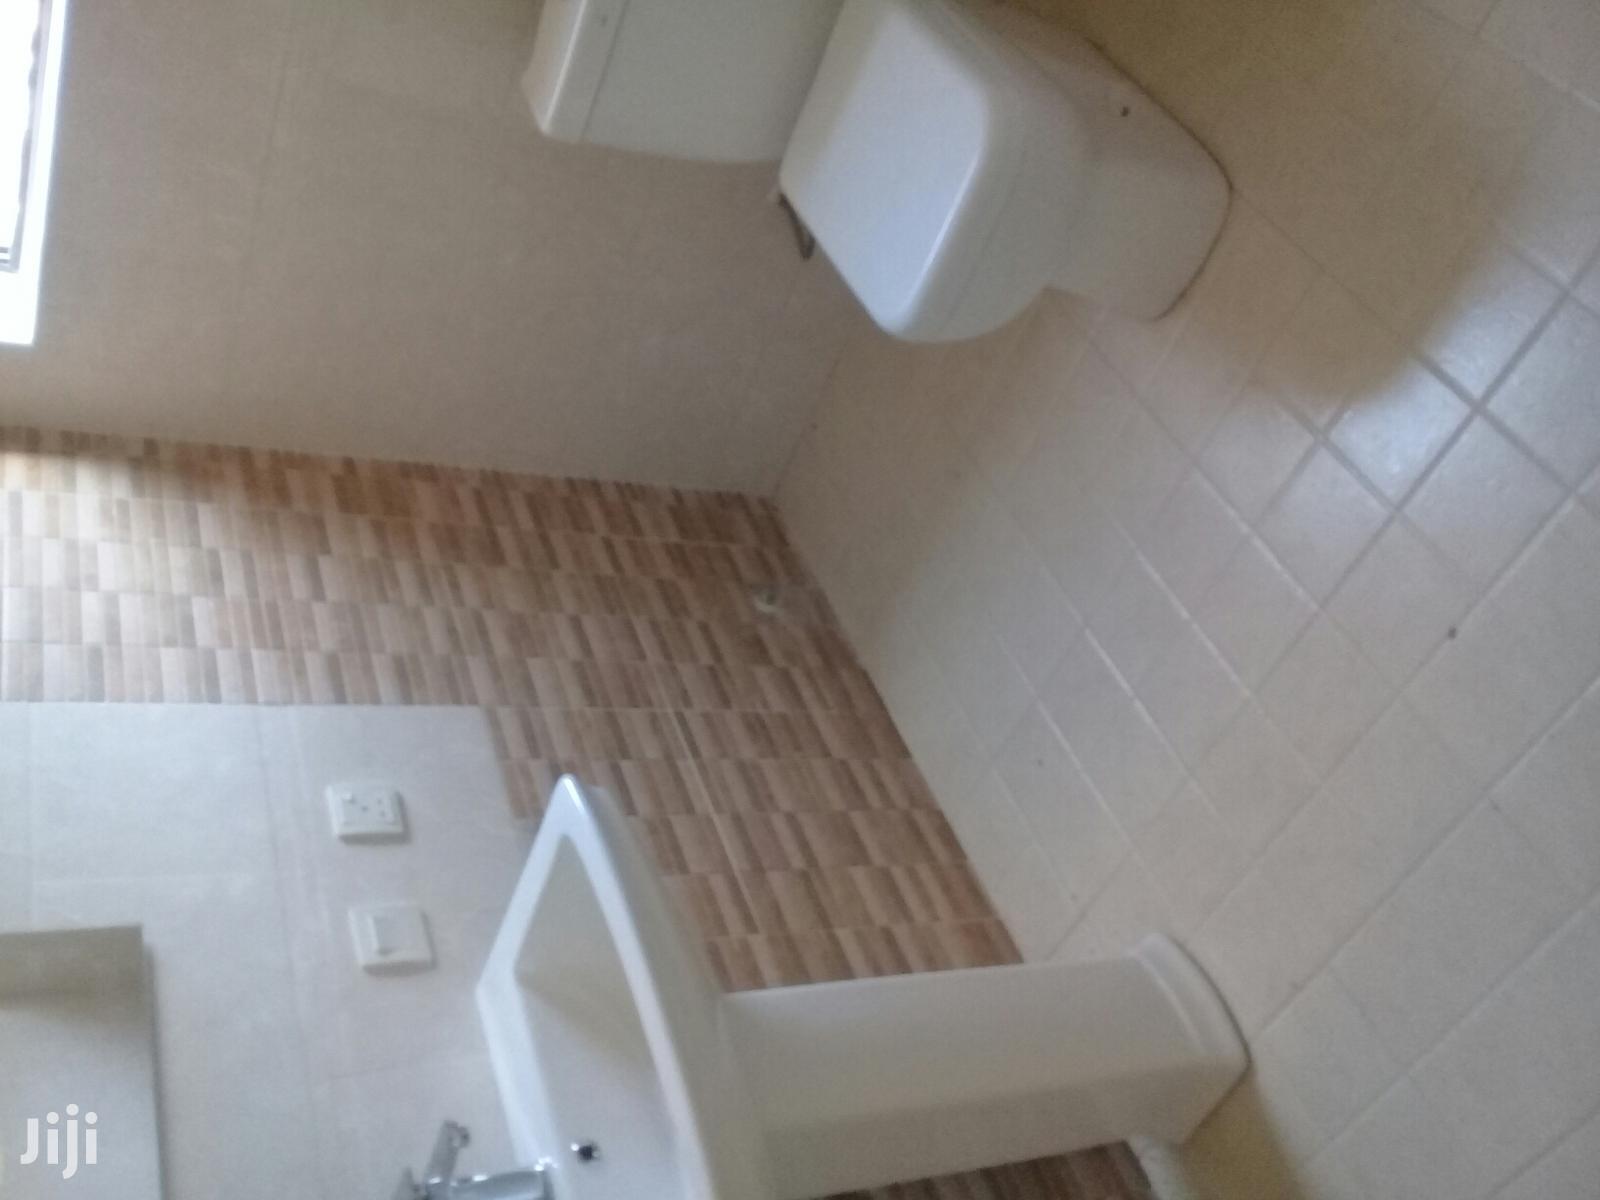 4bedroom House For Sale In East Legon | Houses & Apartments For Sale for sale in East Legon, Greater Accra, Ghana